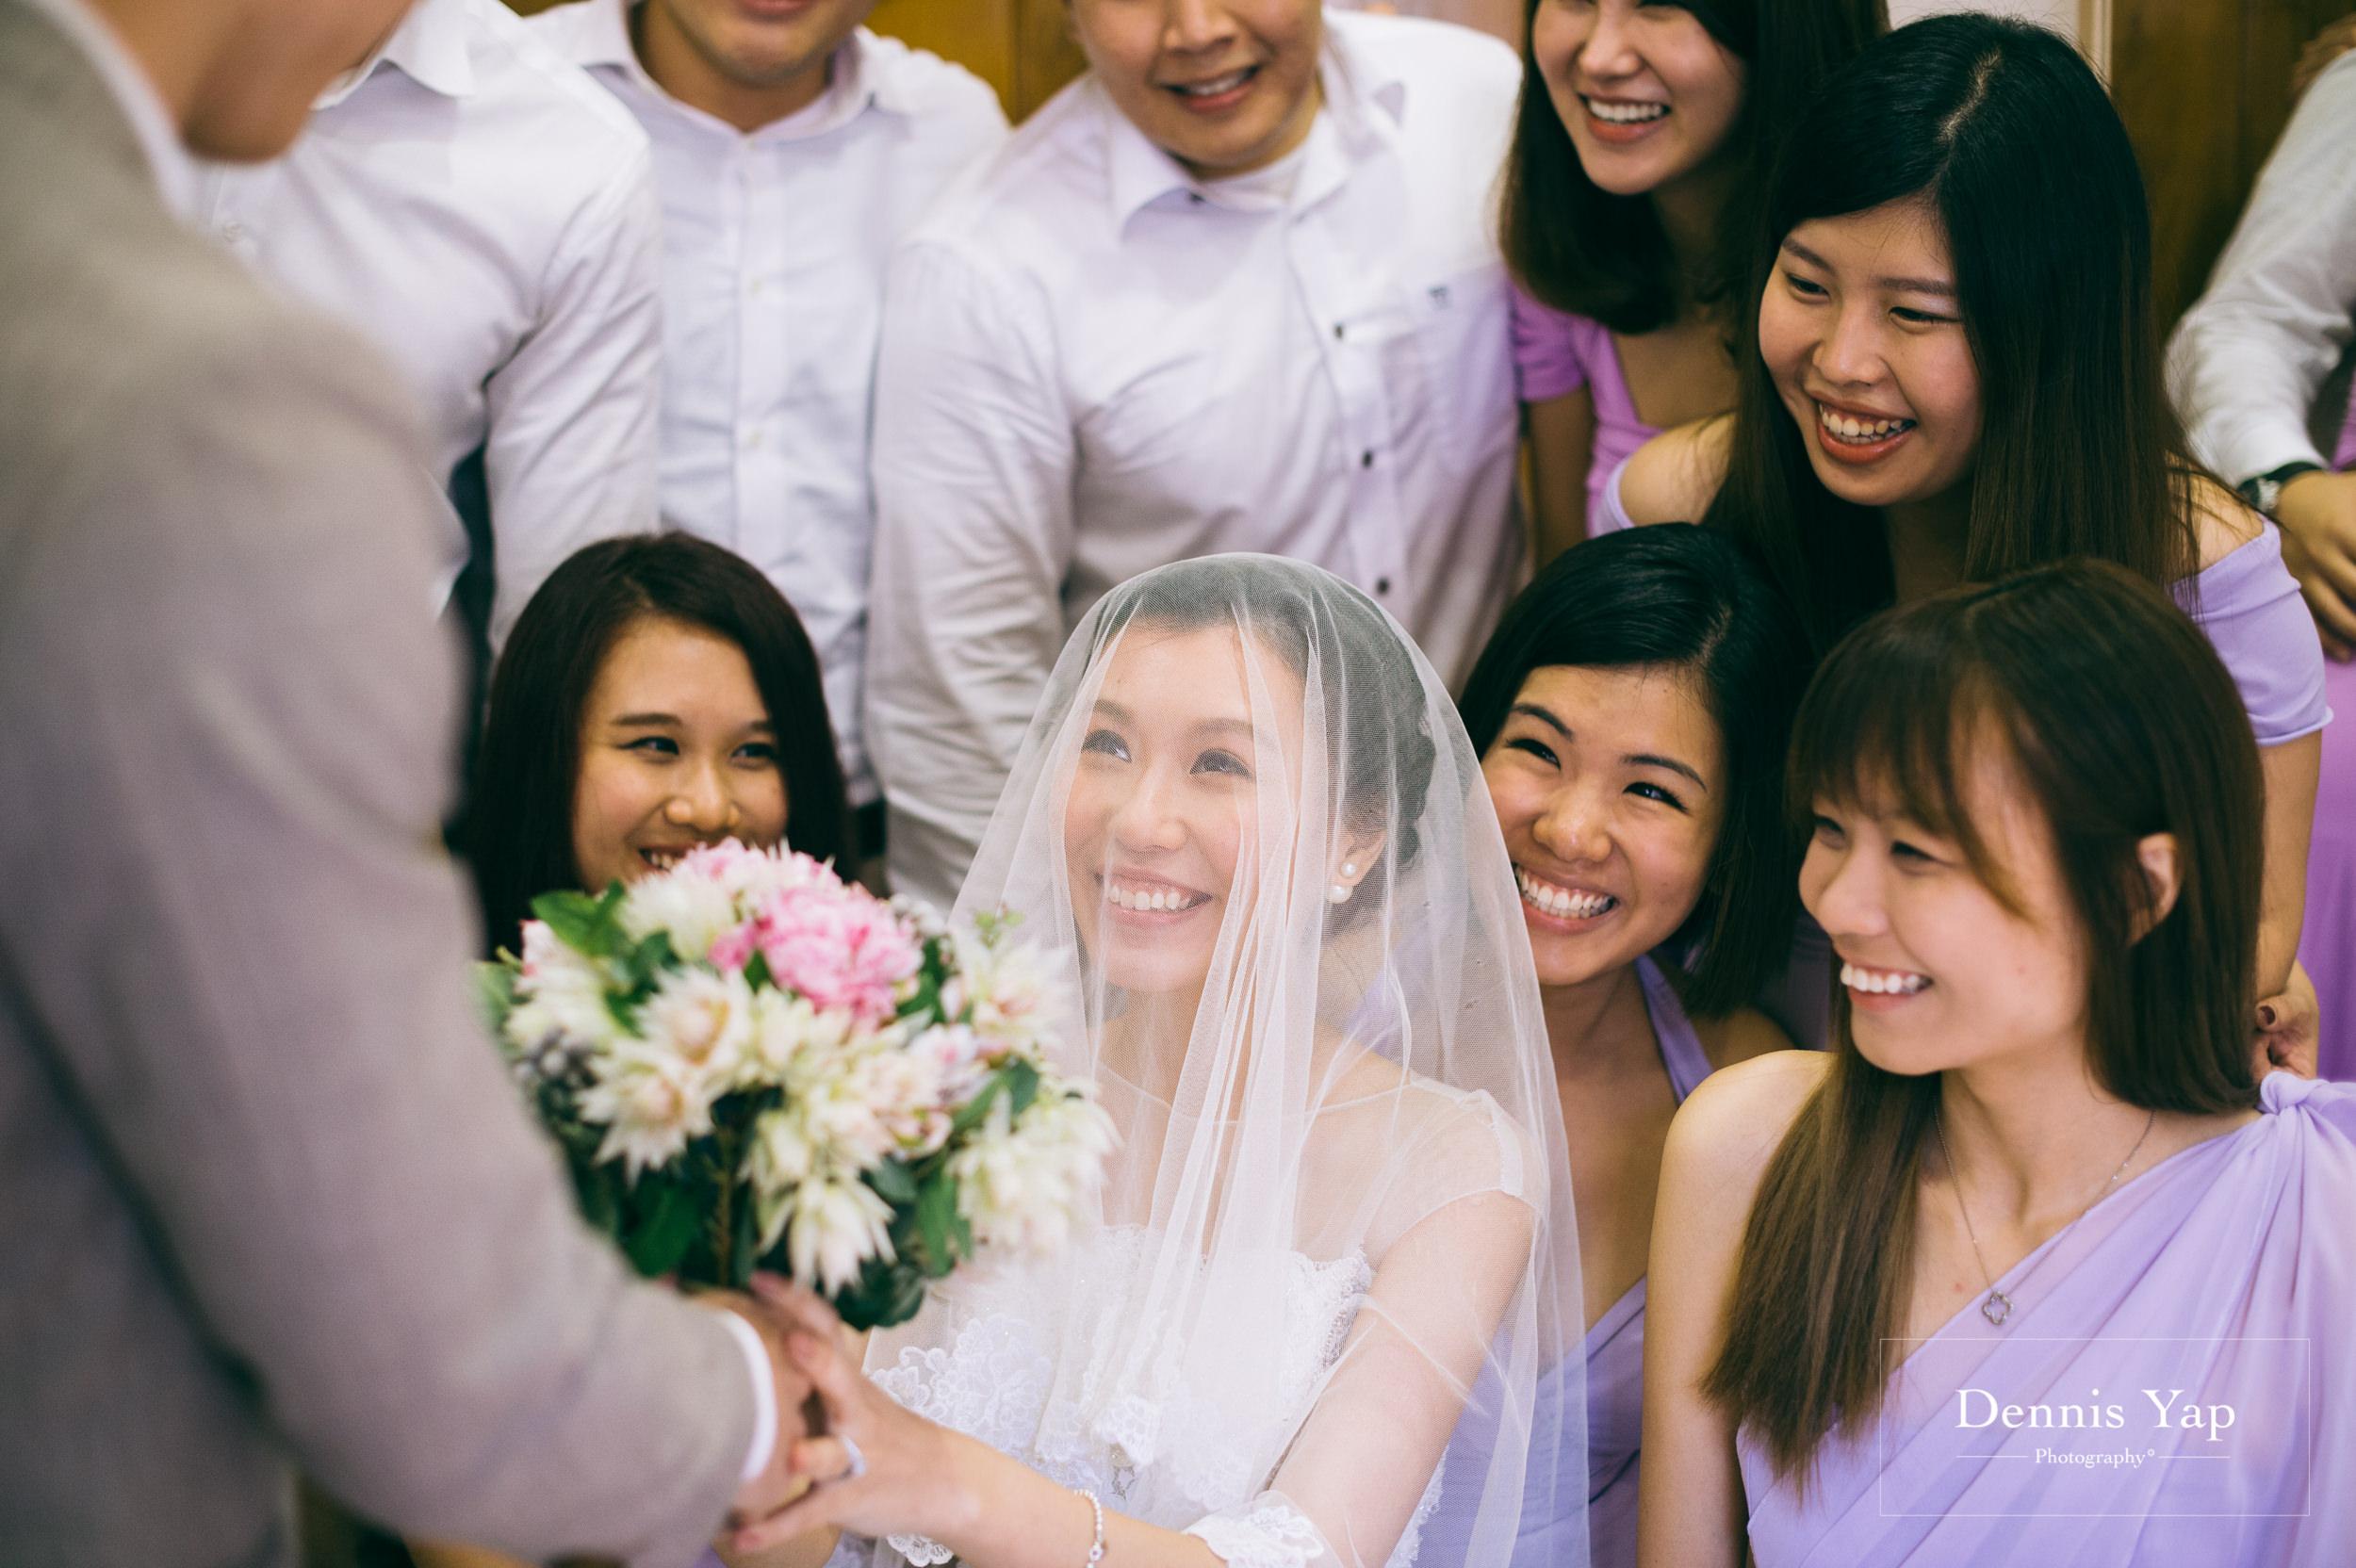 danny sherine wedding day group photo dennis yap photography usj heights malaysia top wedding photographer-8.jpg